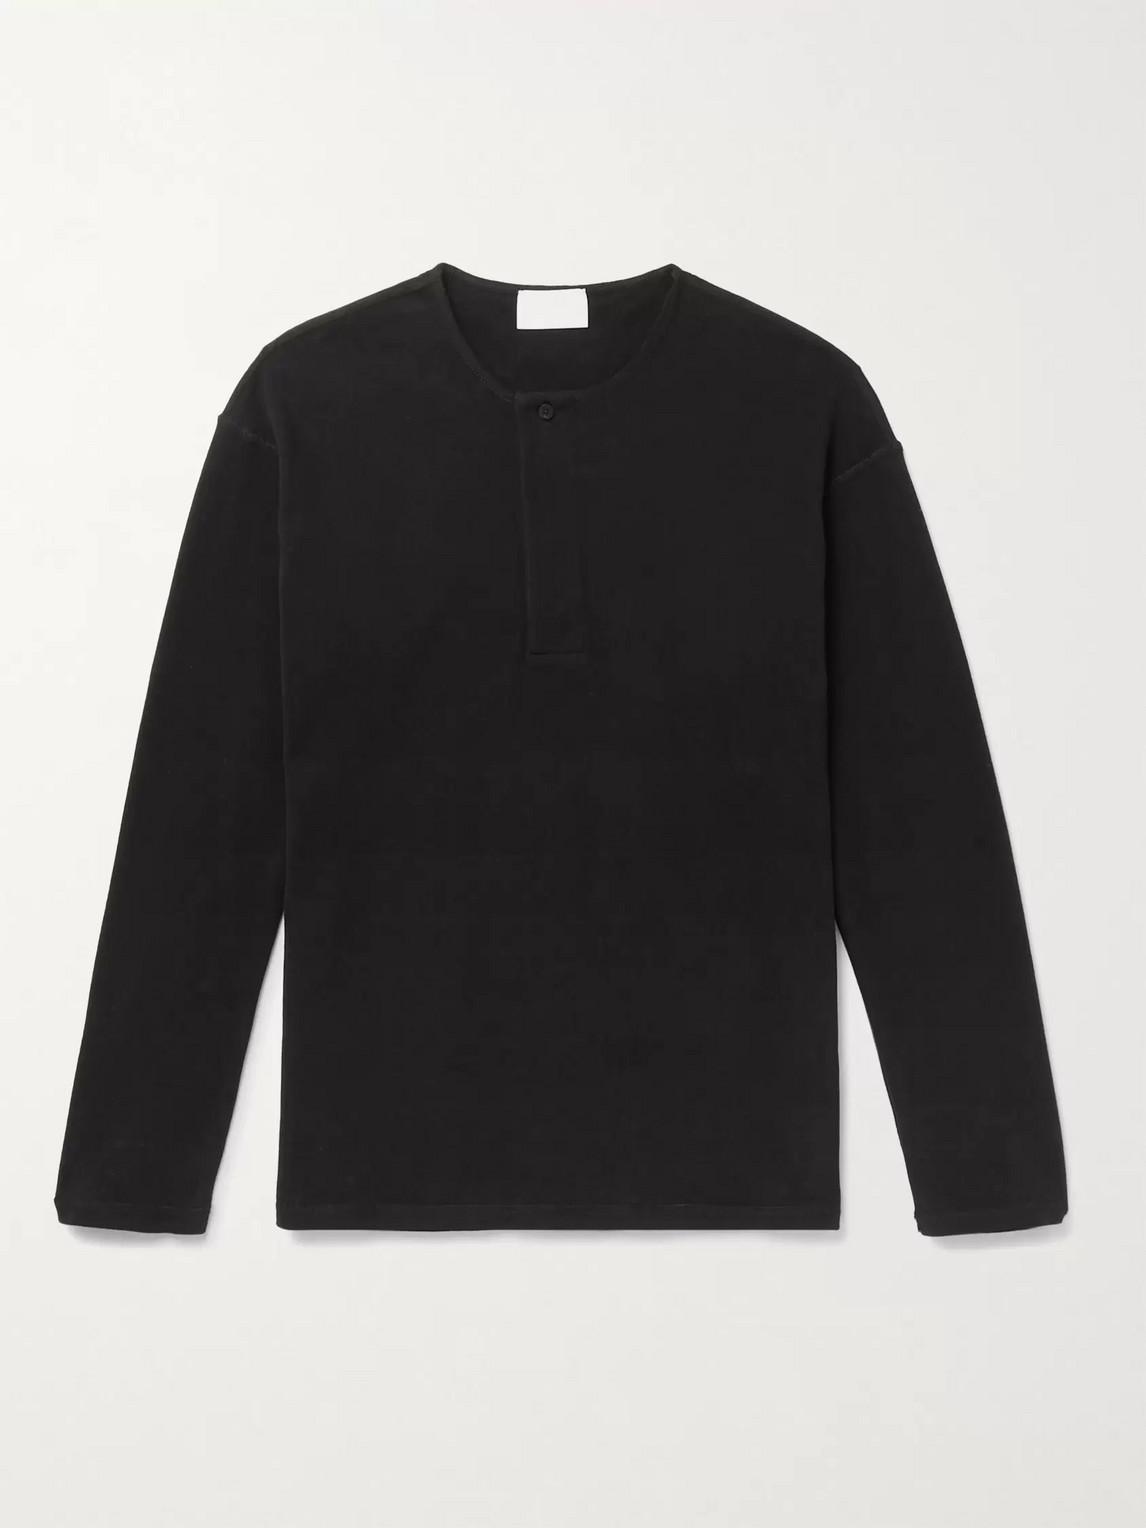 Fear Of God For Ermenegildo Zegna Cotton-jersey Henley T-shirt In Black